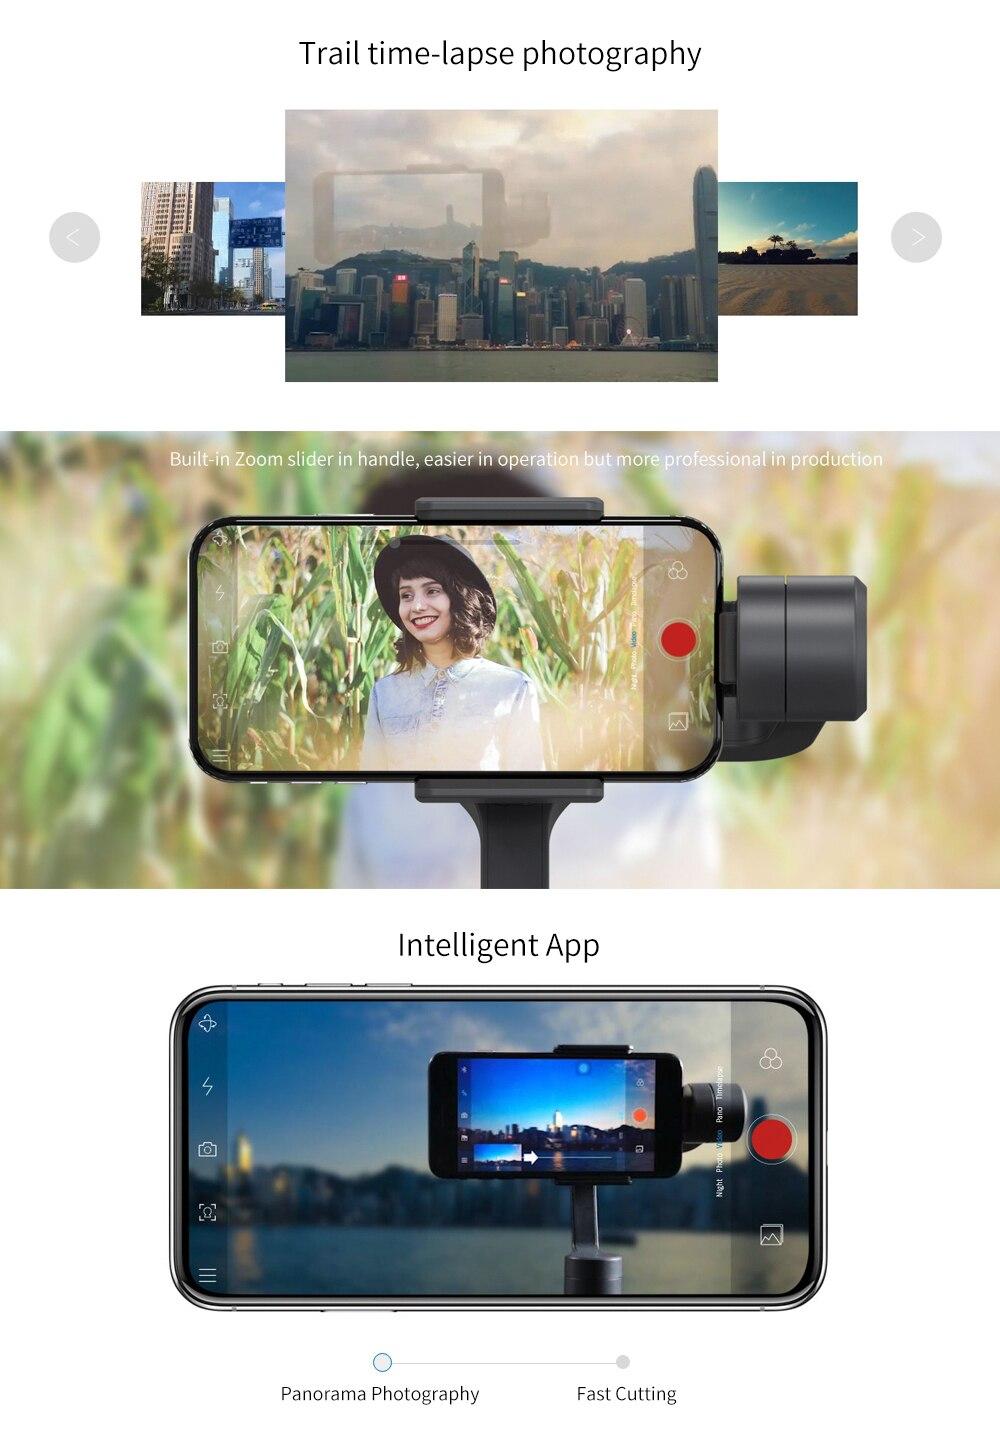 Feiyu vimble 2 Smartphone 3-Axis Handheld Gimbal Stabilizer bluetooth wireless selfie stick for iPhone X Gopro sjcam Smooth Q 4